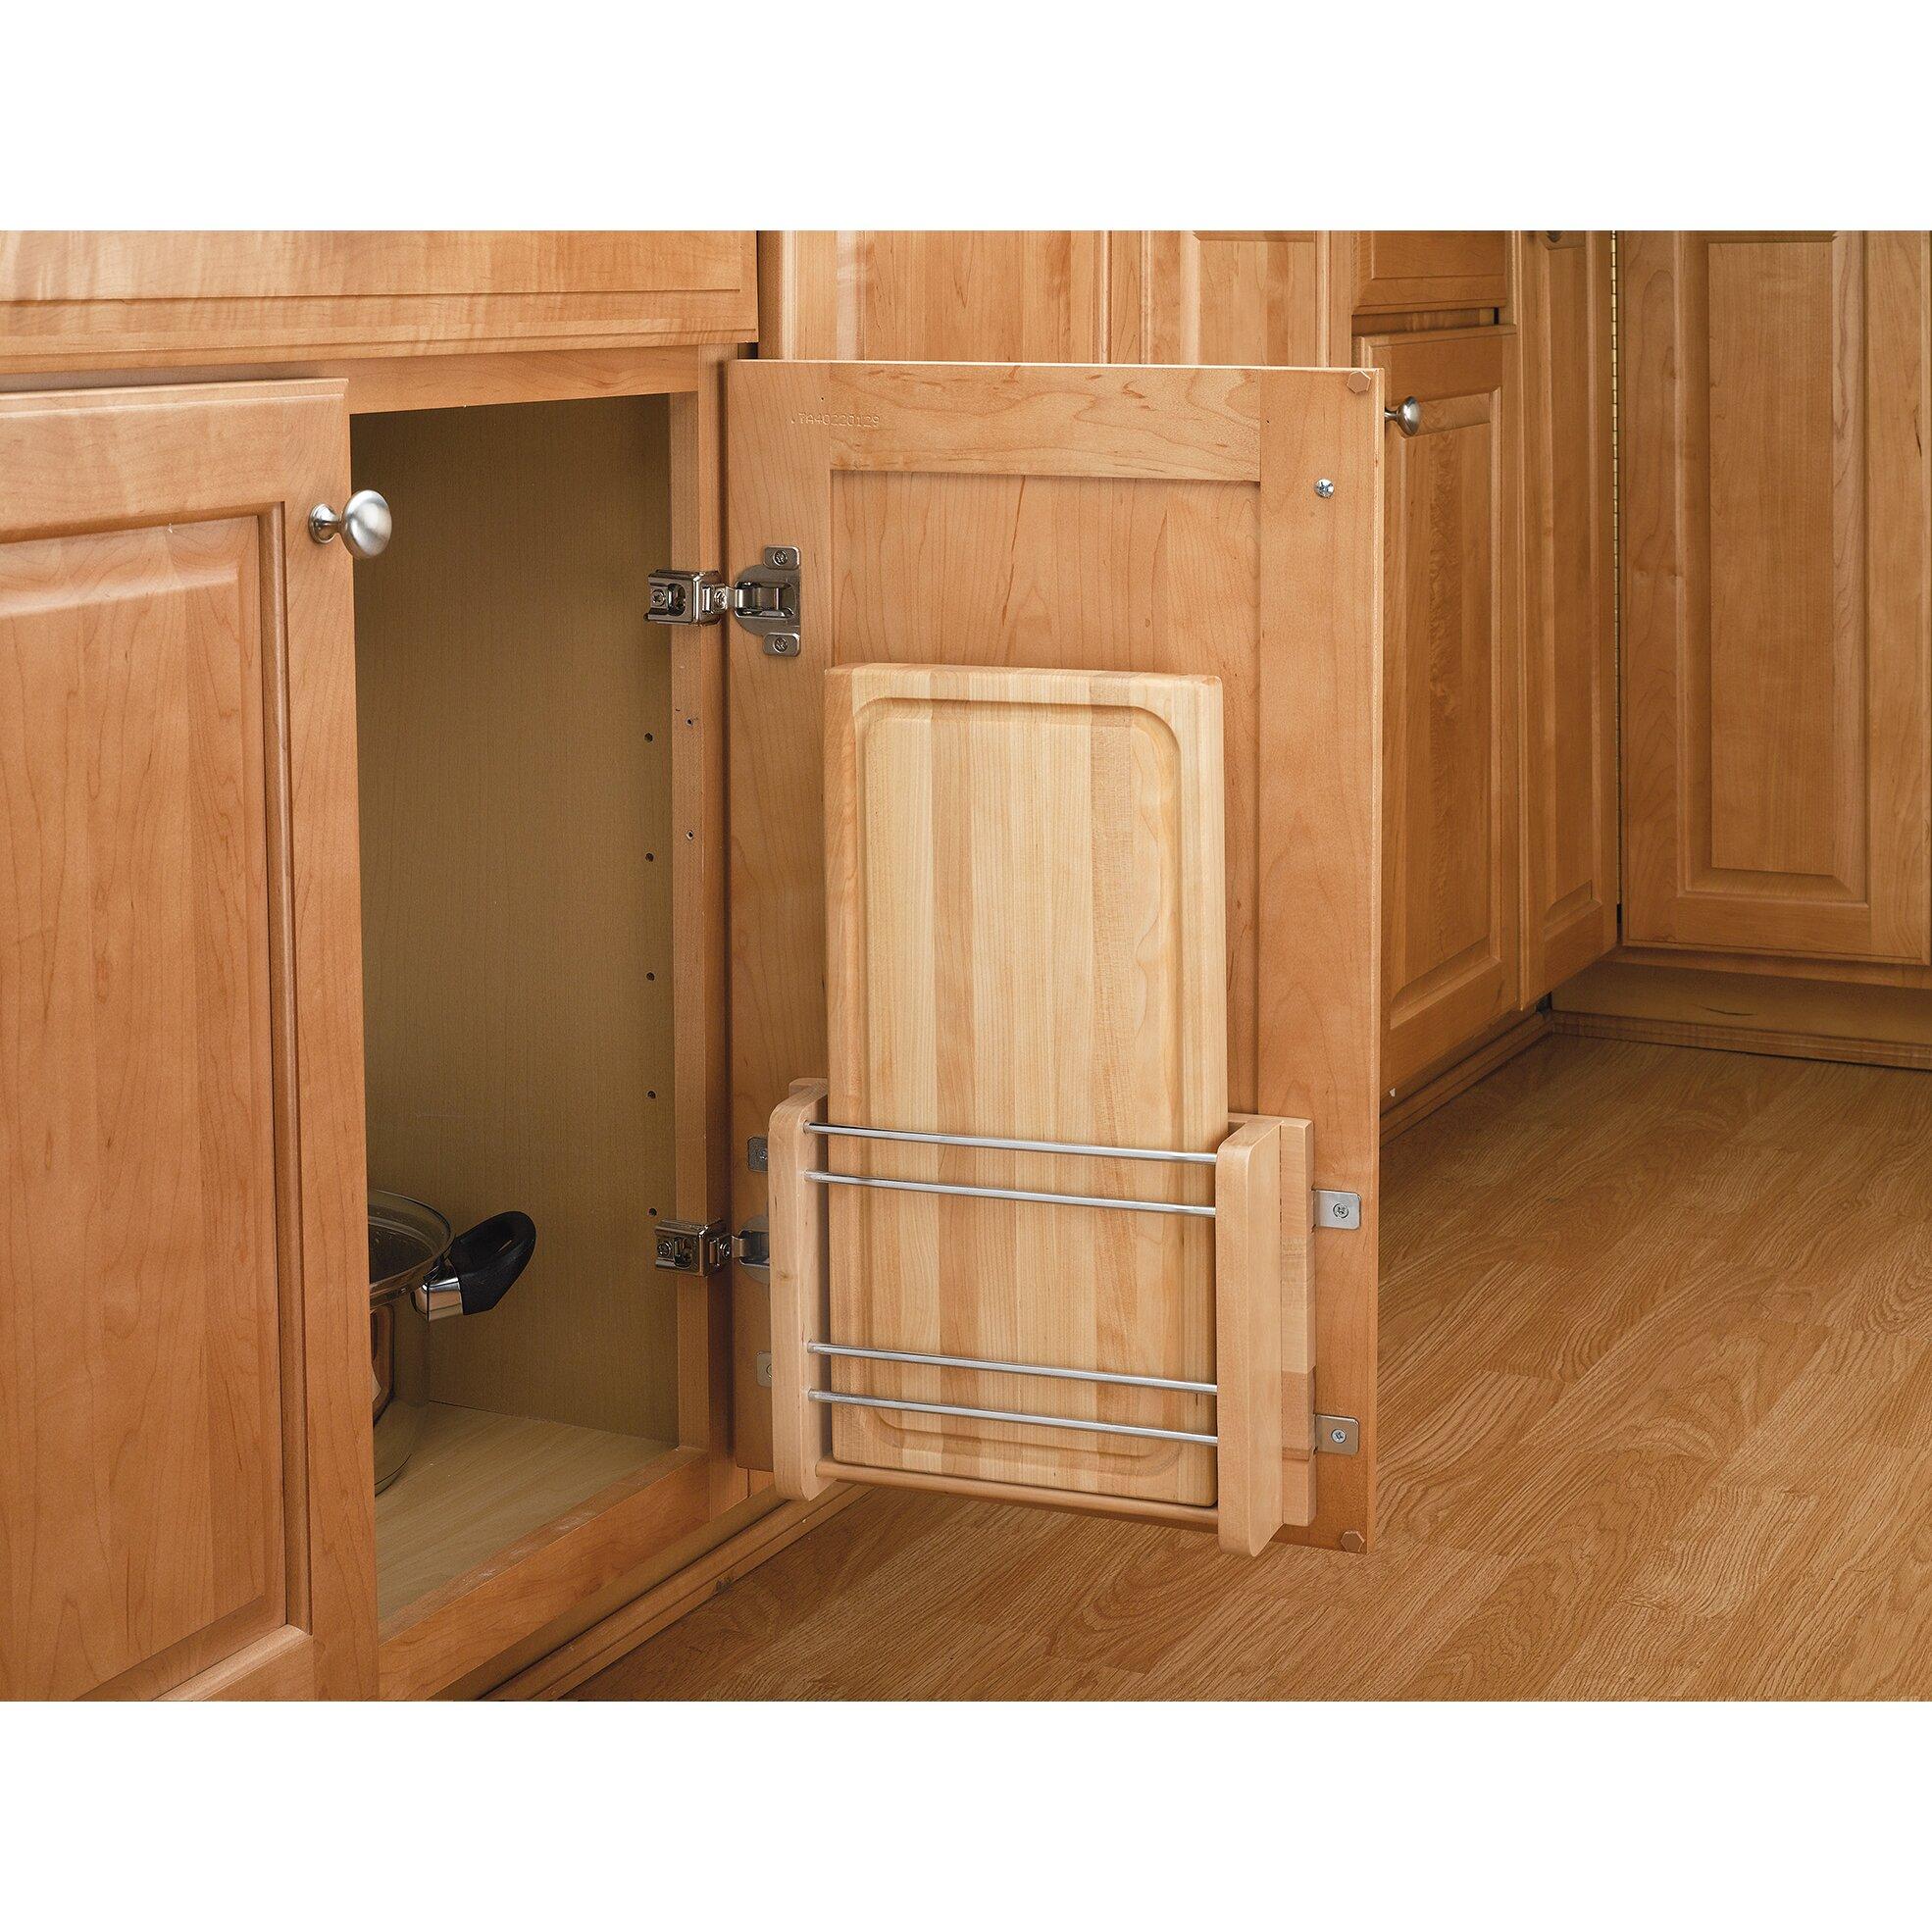 Cutting Kitchen Cabinets: Rev-A-Shelf Cabinet Door Mount Cutting Board